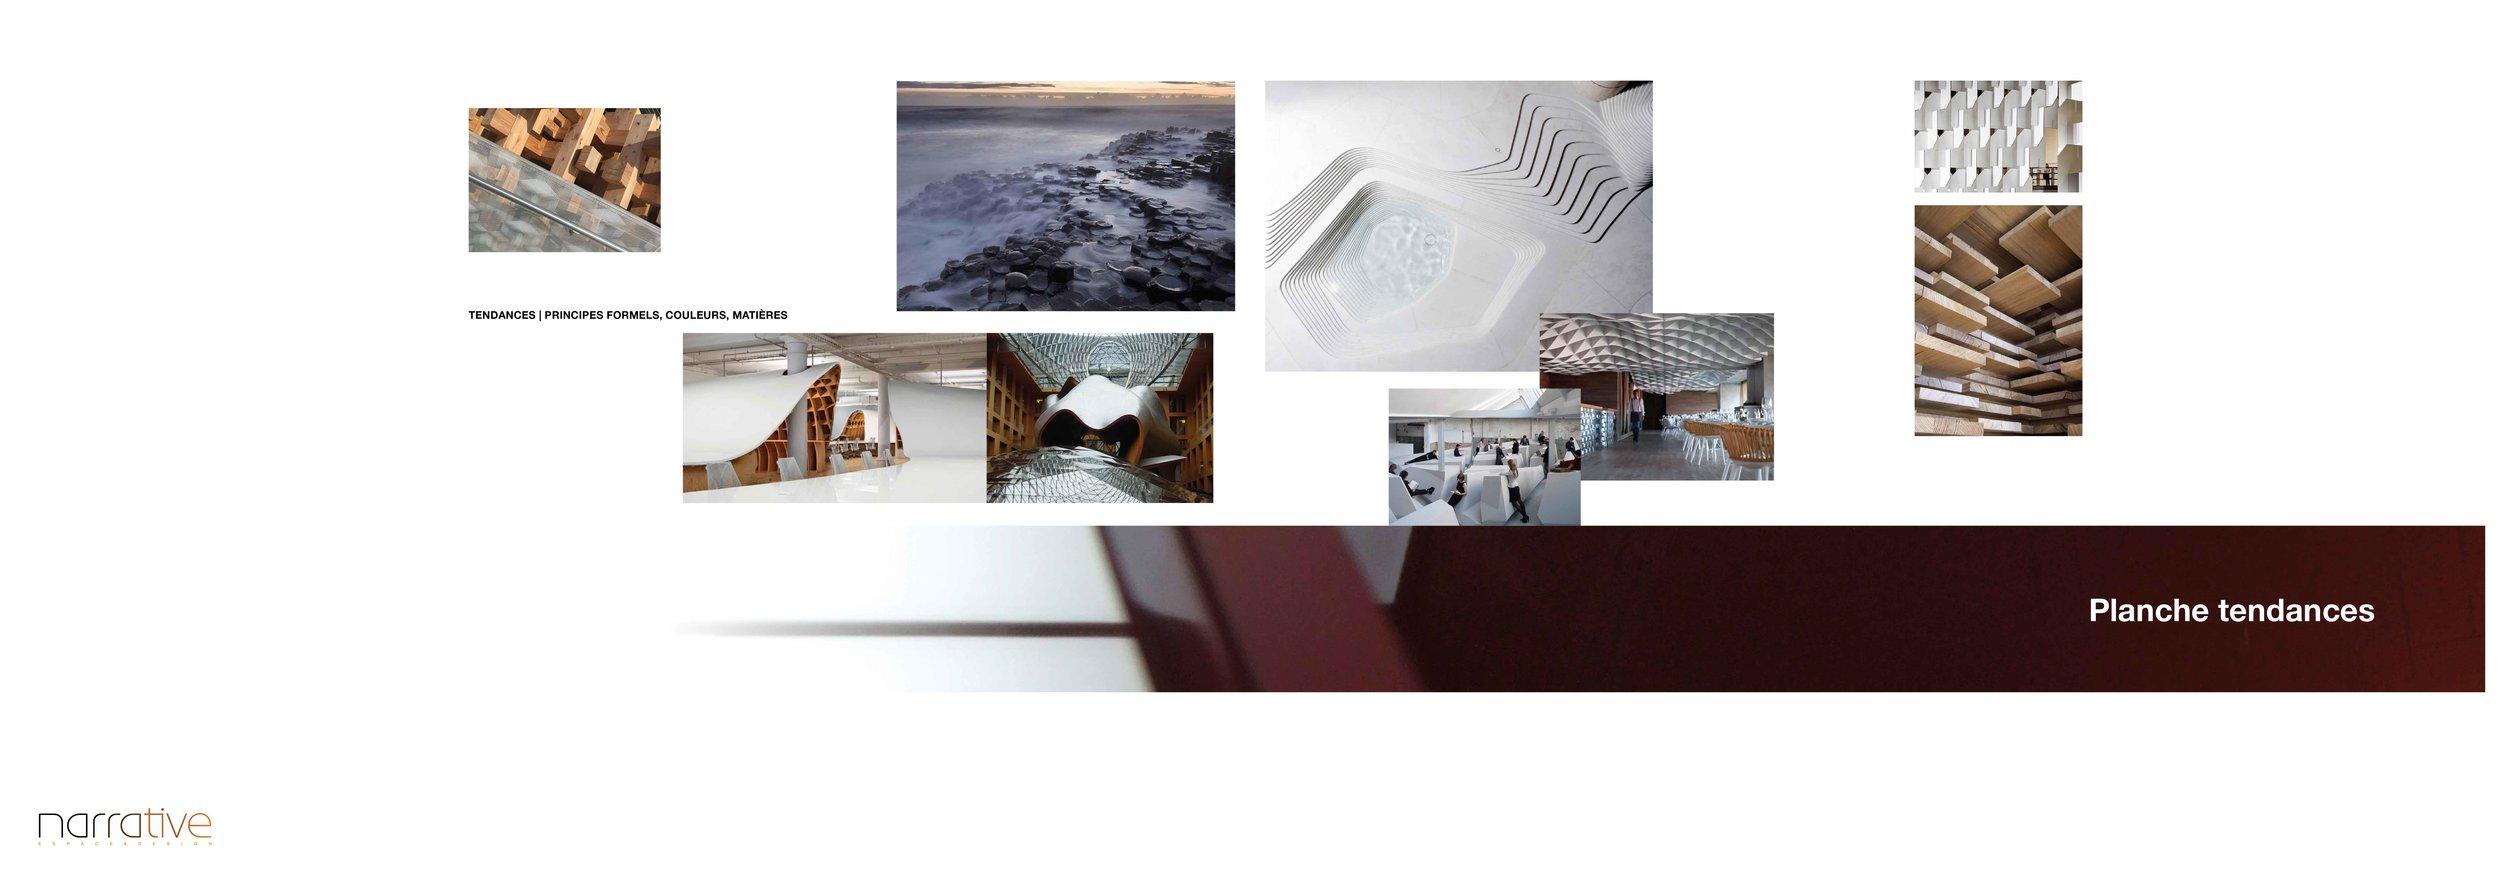 conception-modelisation-BIM-design-stand-espace-salon-agence-narrative-.jpg